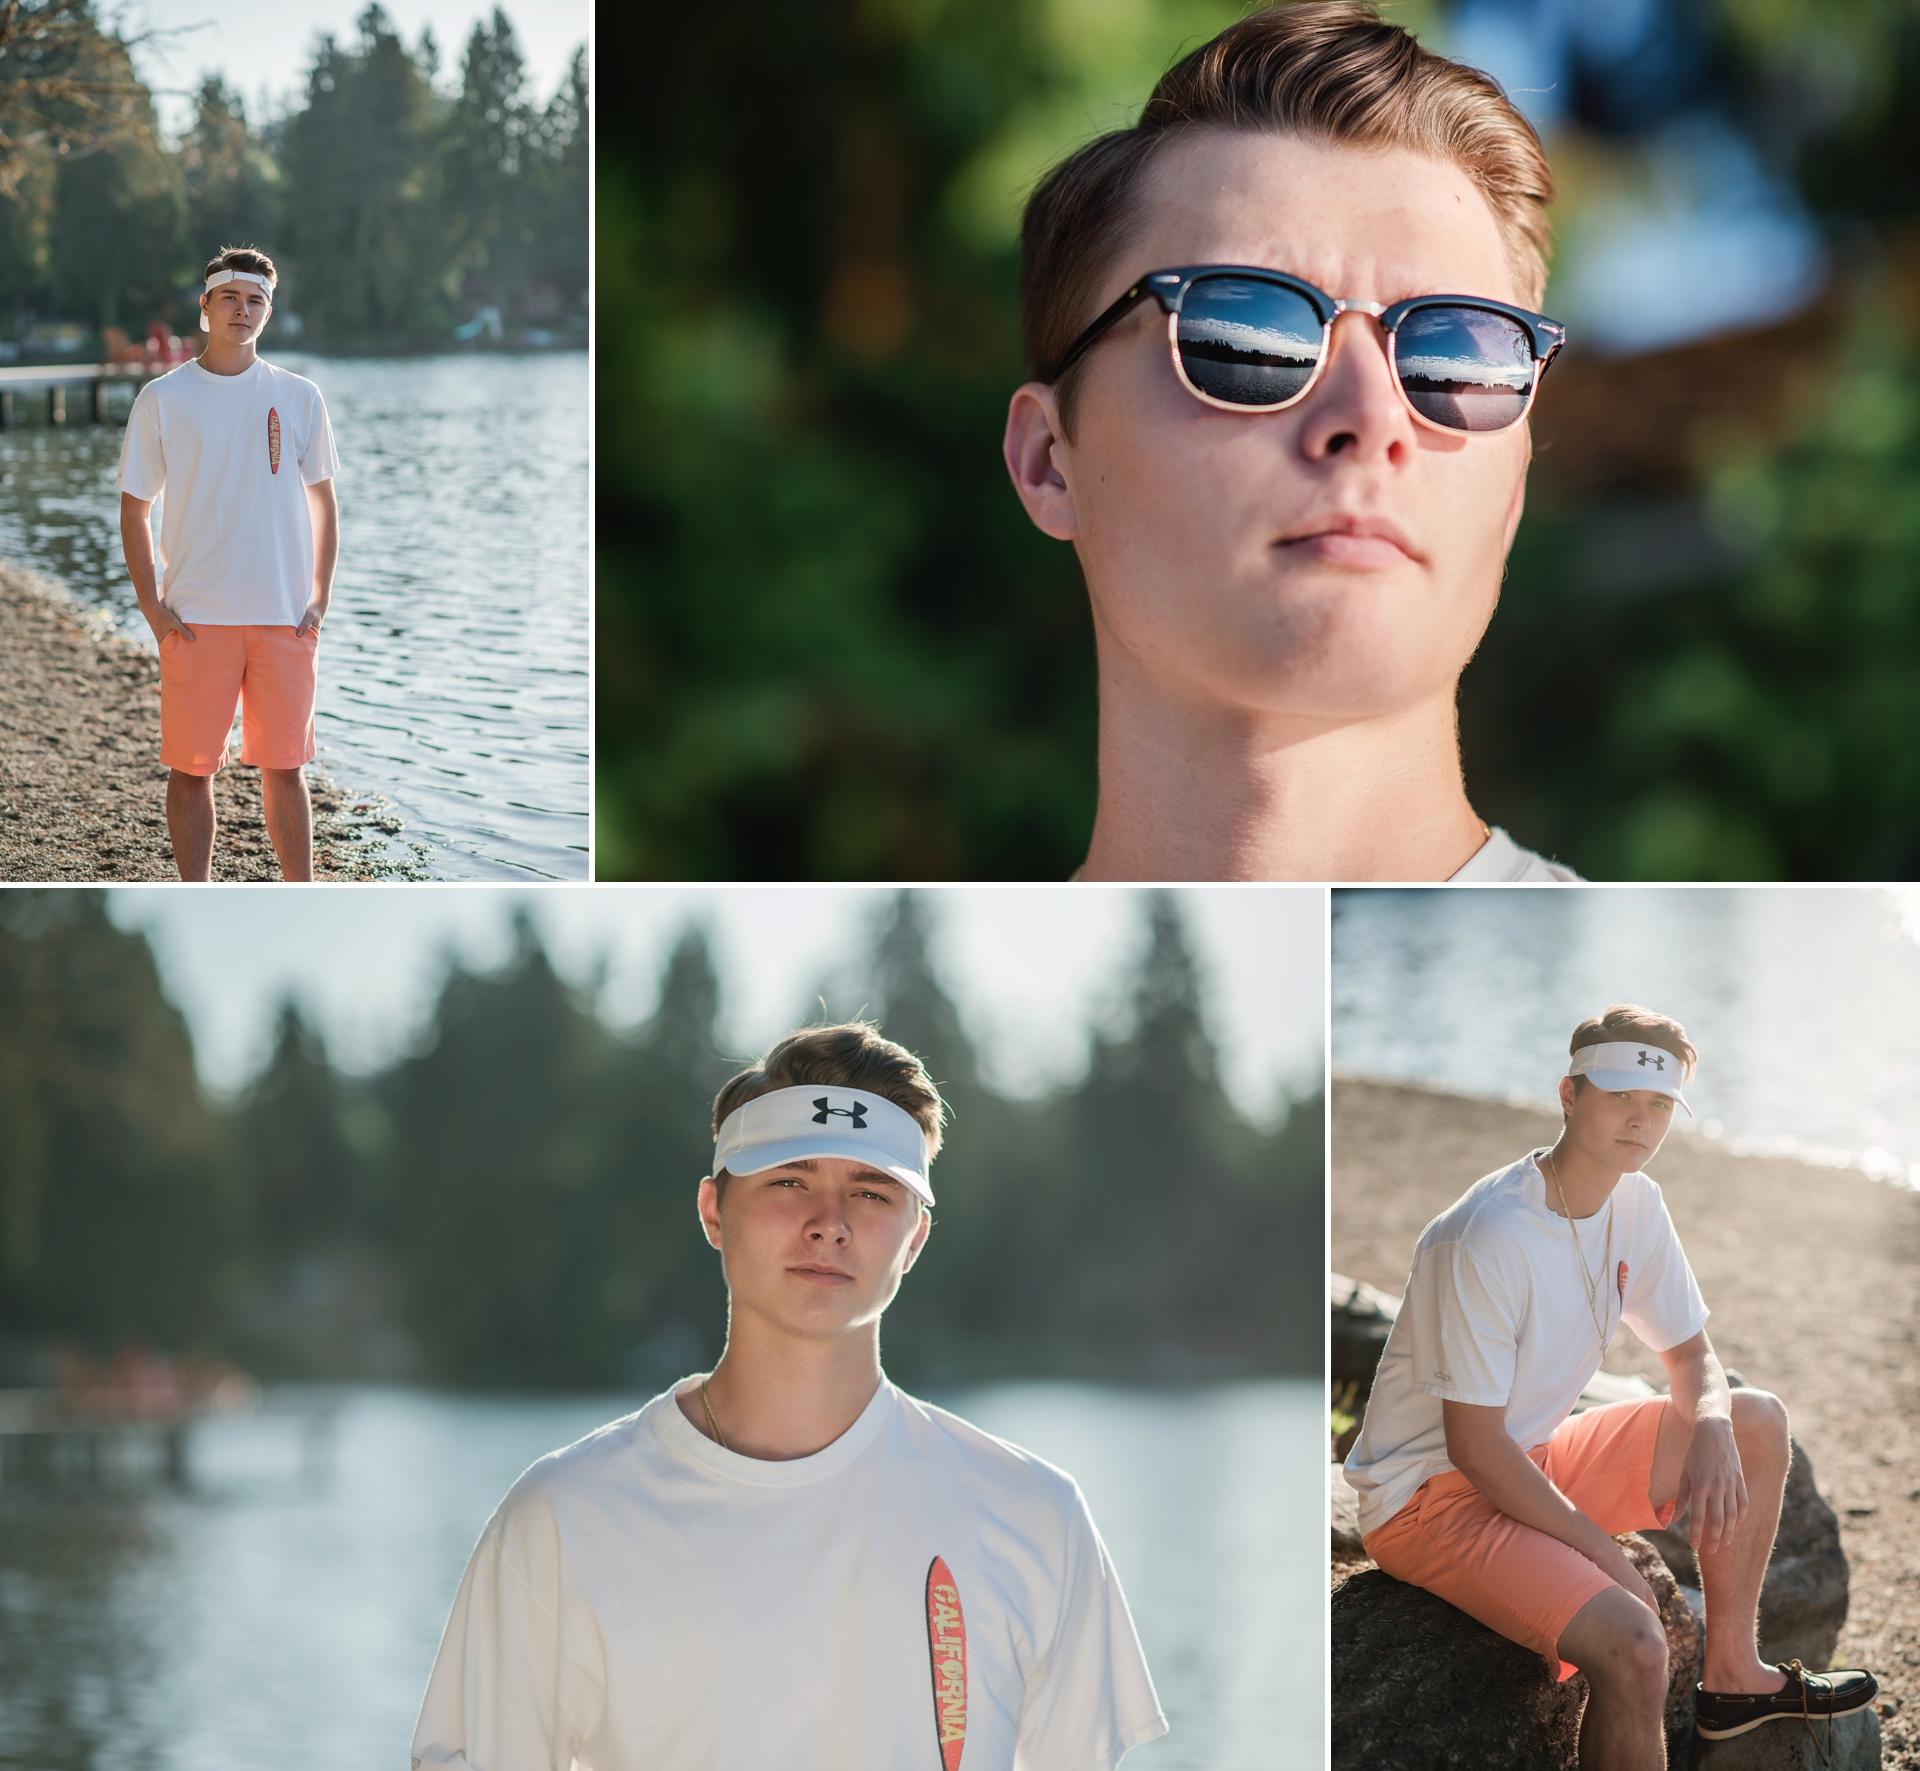 Mary Vance Photography Senior Guy Photographer Sammamish Washington Eastlake High School Baseball